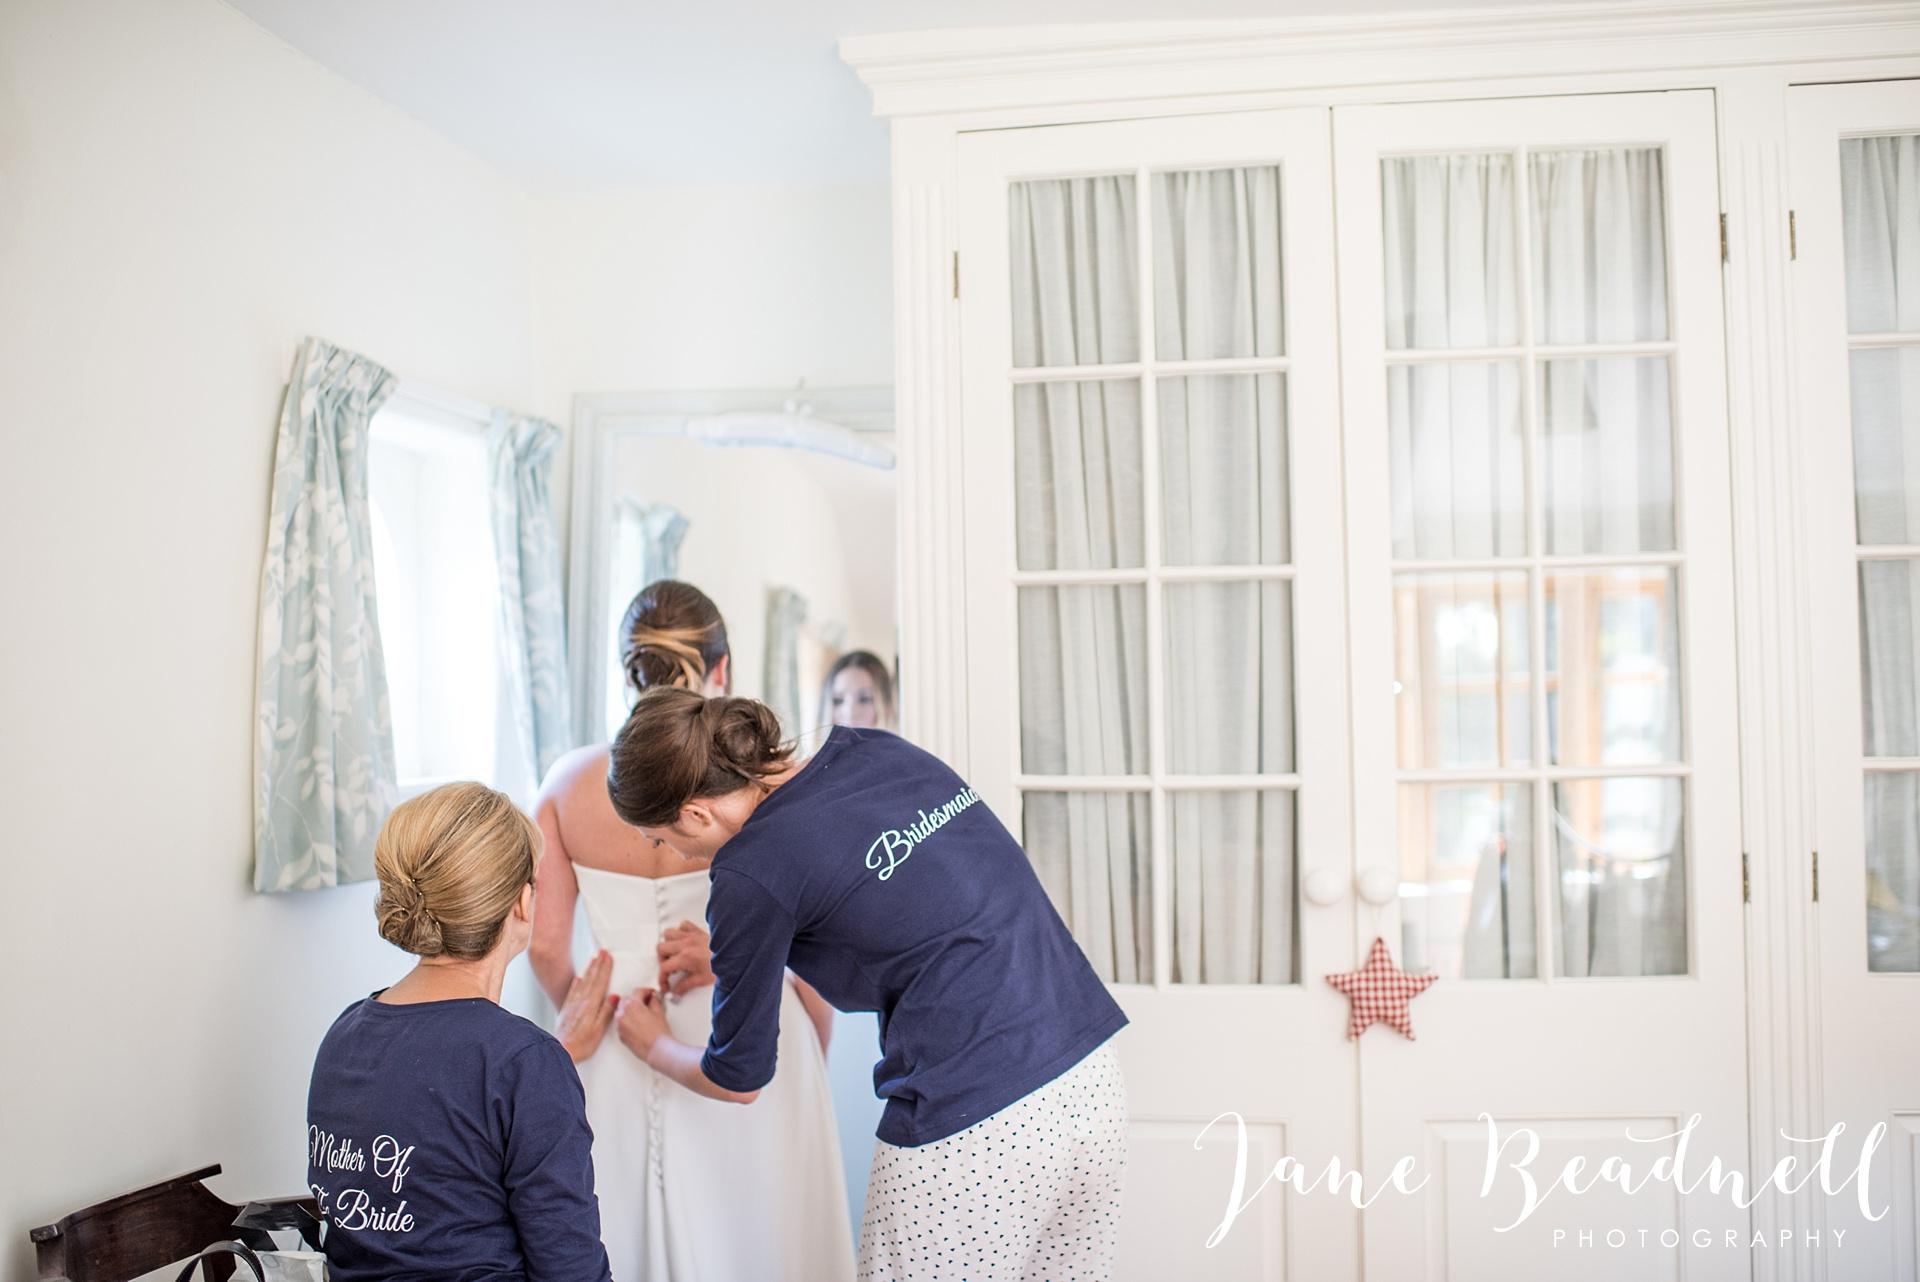 fine-art-wedding-photographer-jane-beadnell-yorkshire-wedding-photographer_0019